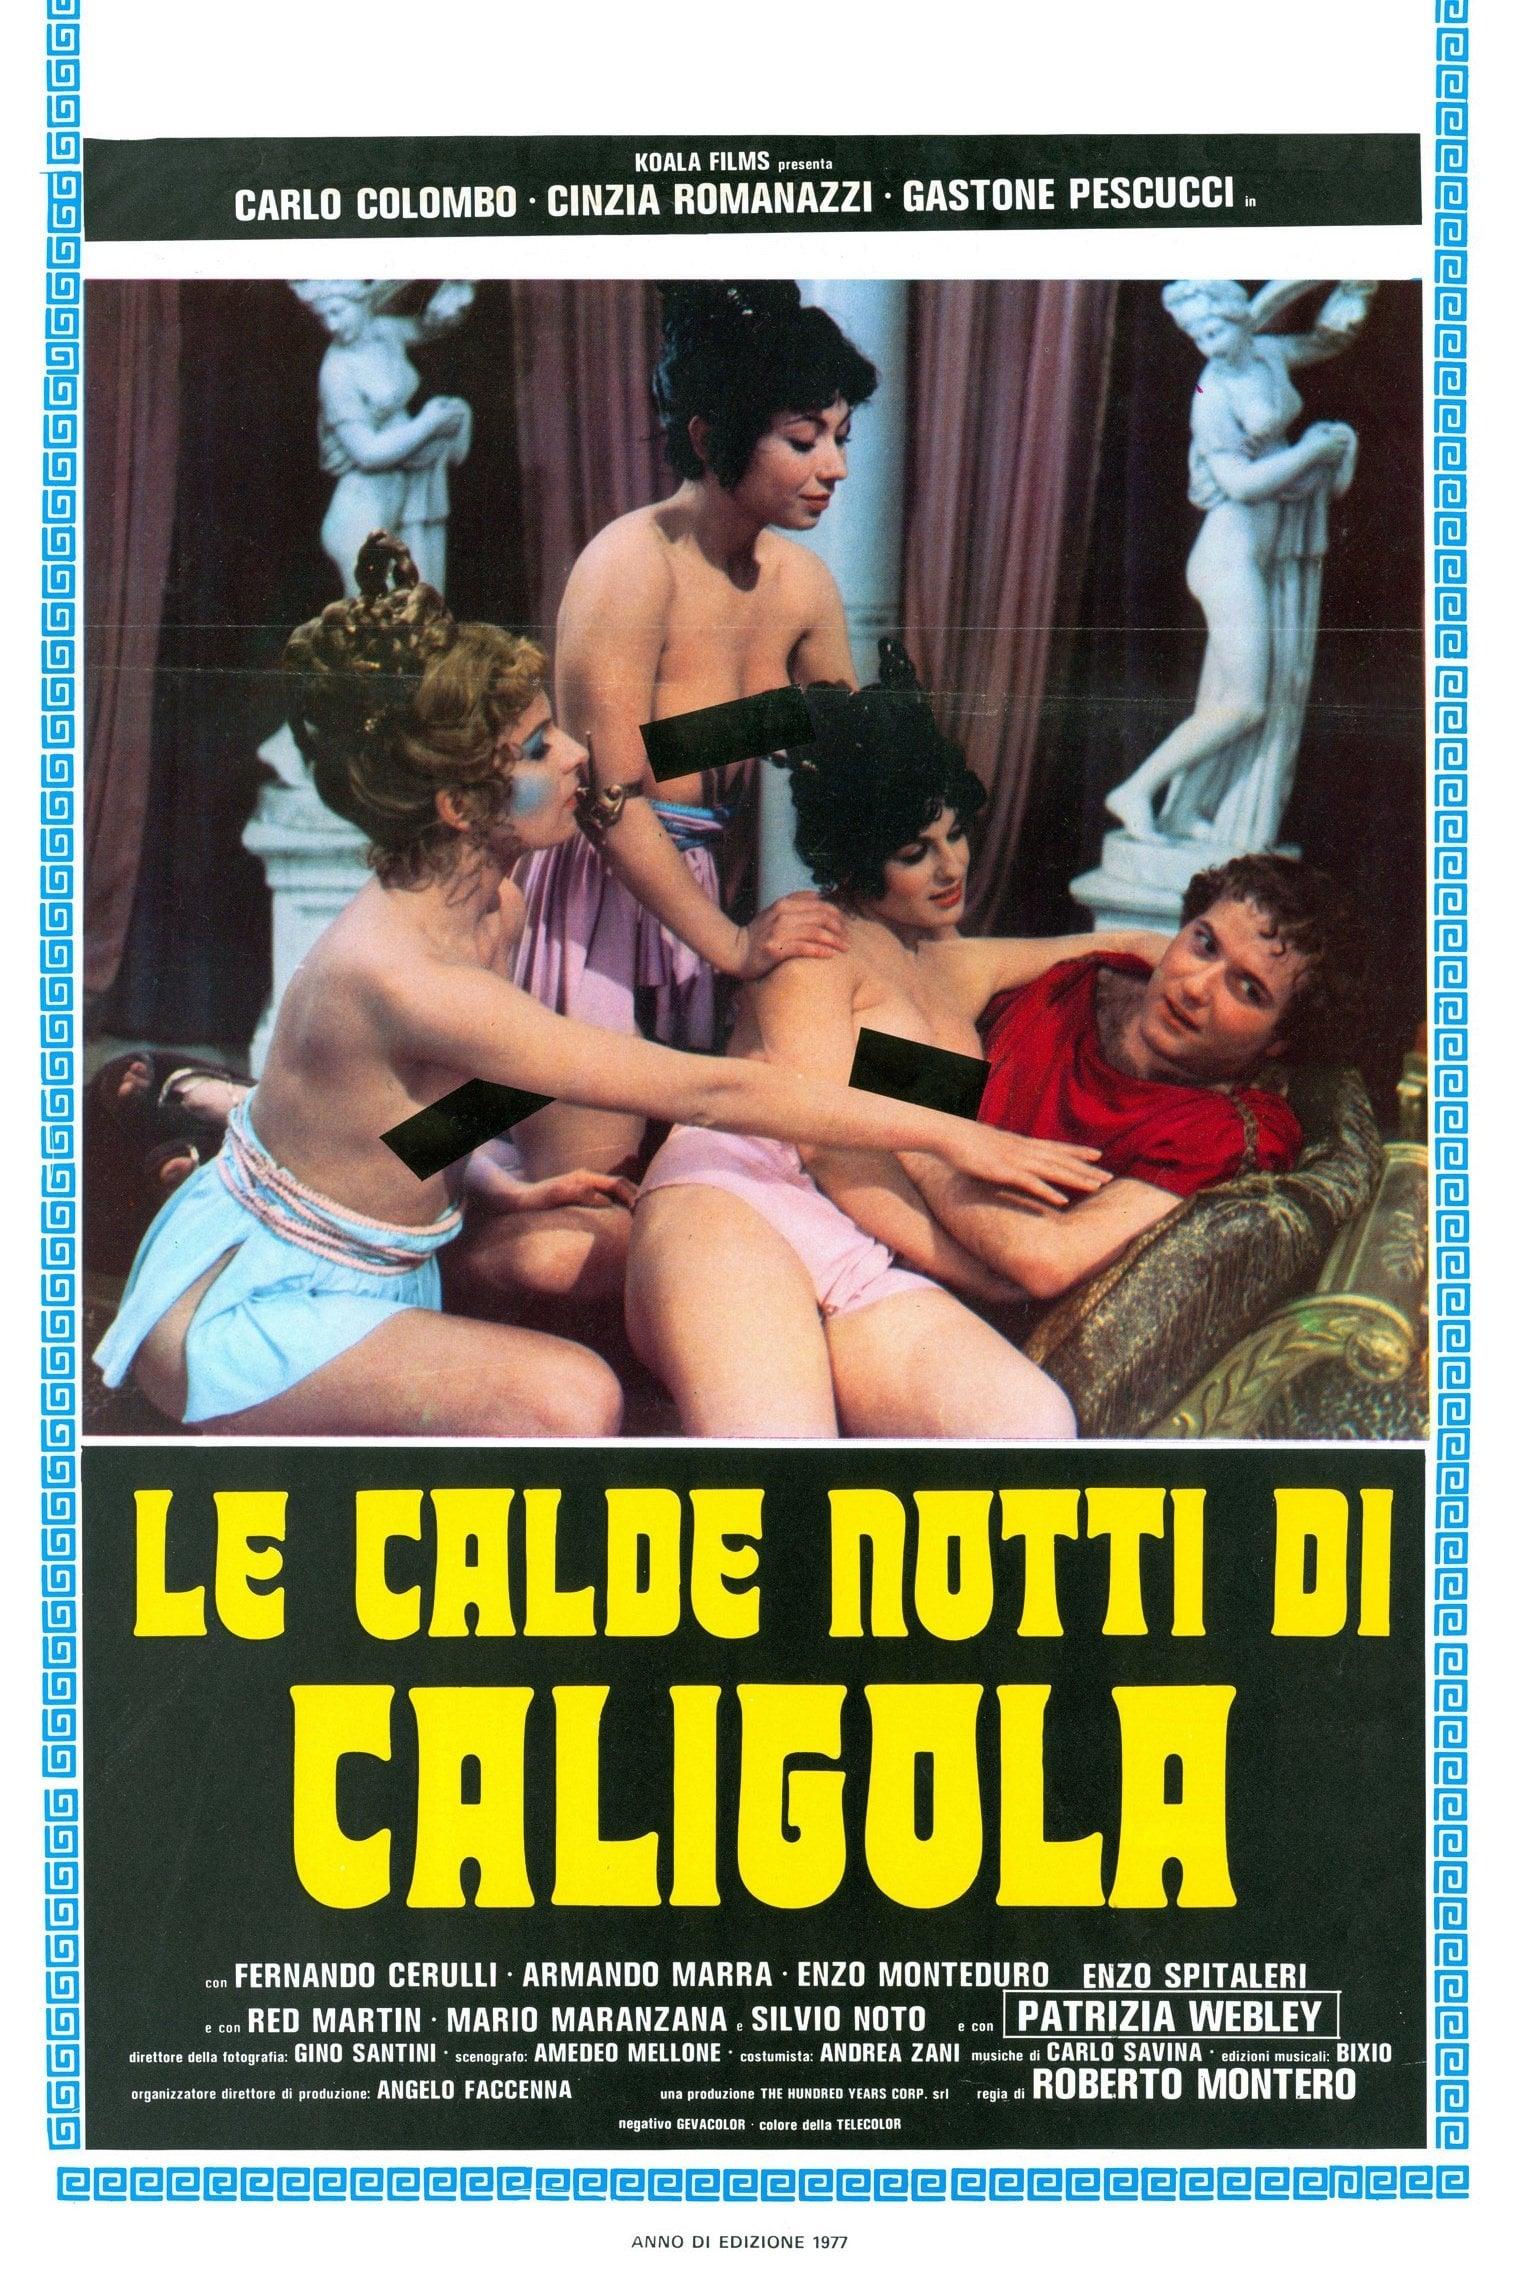 Las calientes noches de Caligula